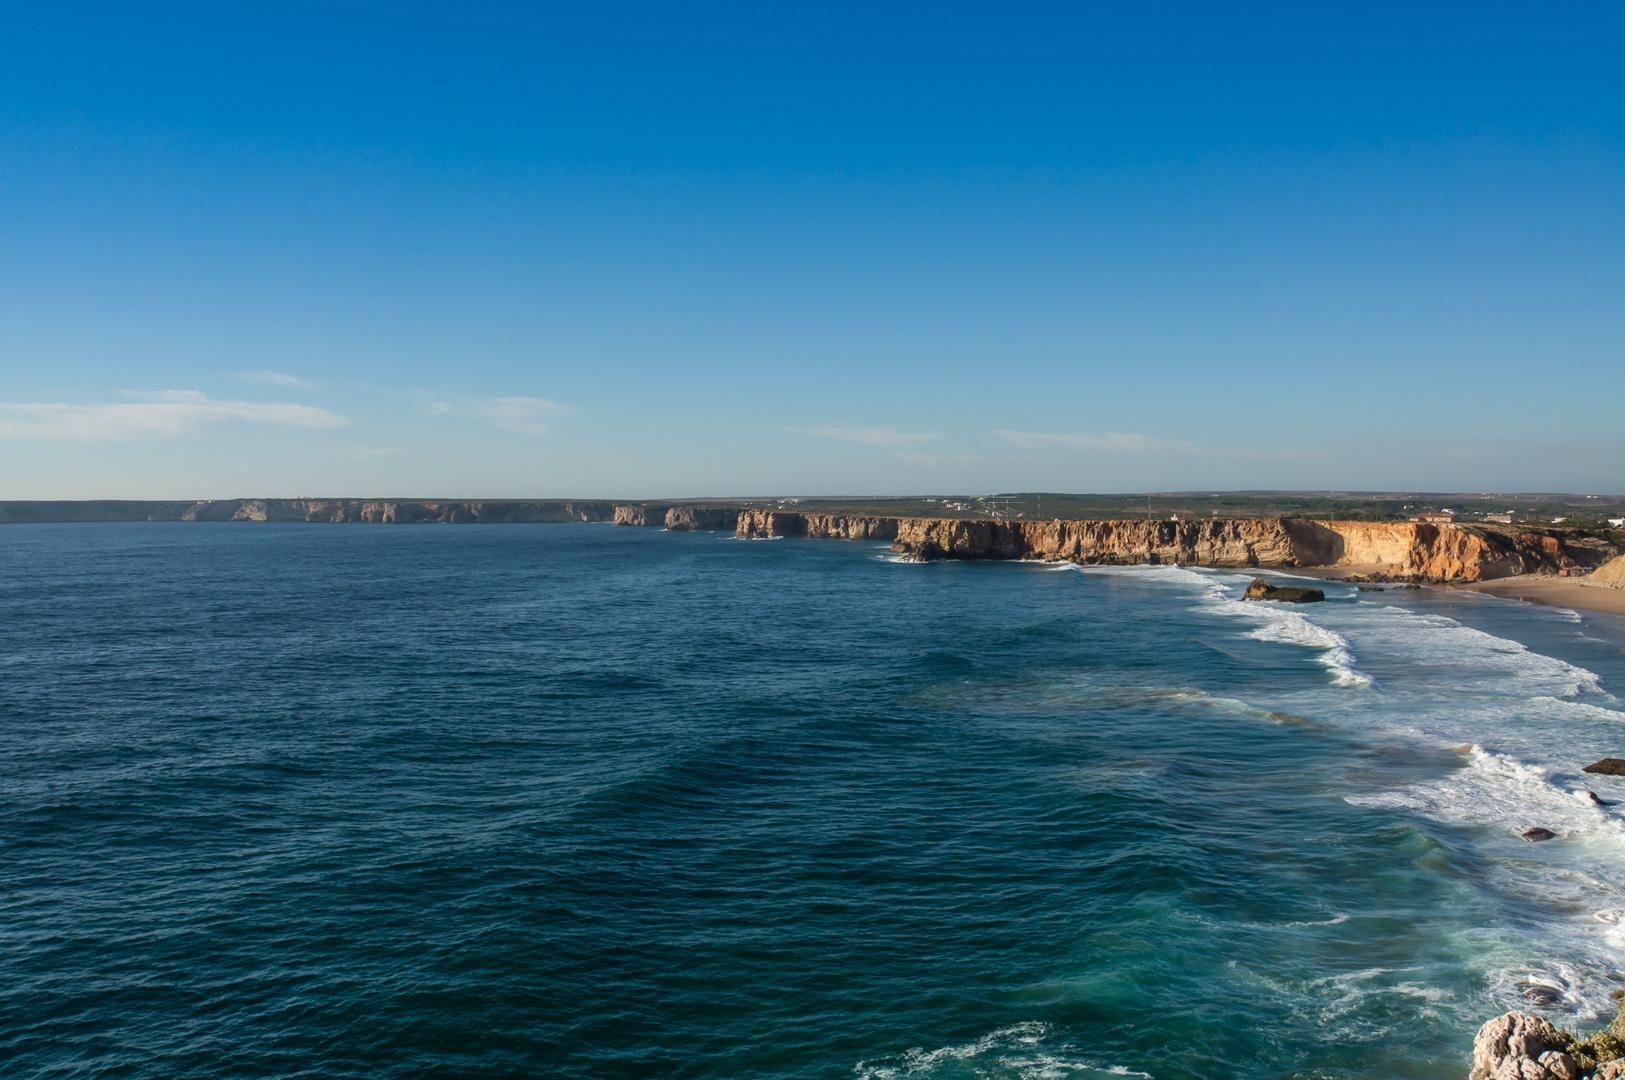 8 Portugal2013 Aufnahme vom Fortaleza de Sagres aus. Der Praia do Tonel.